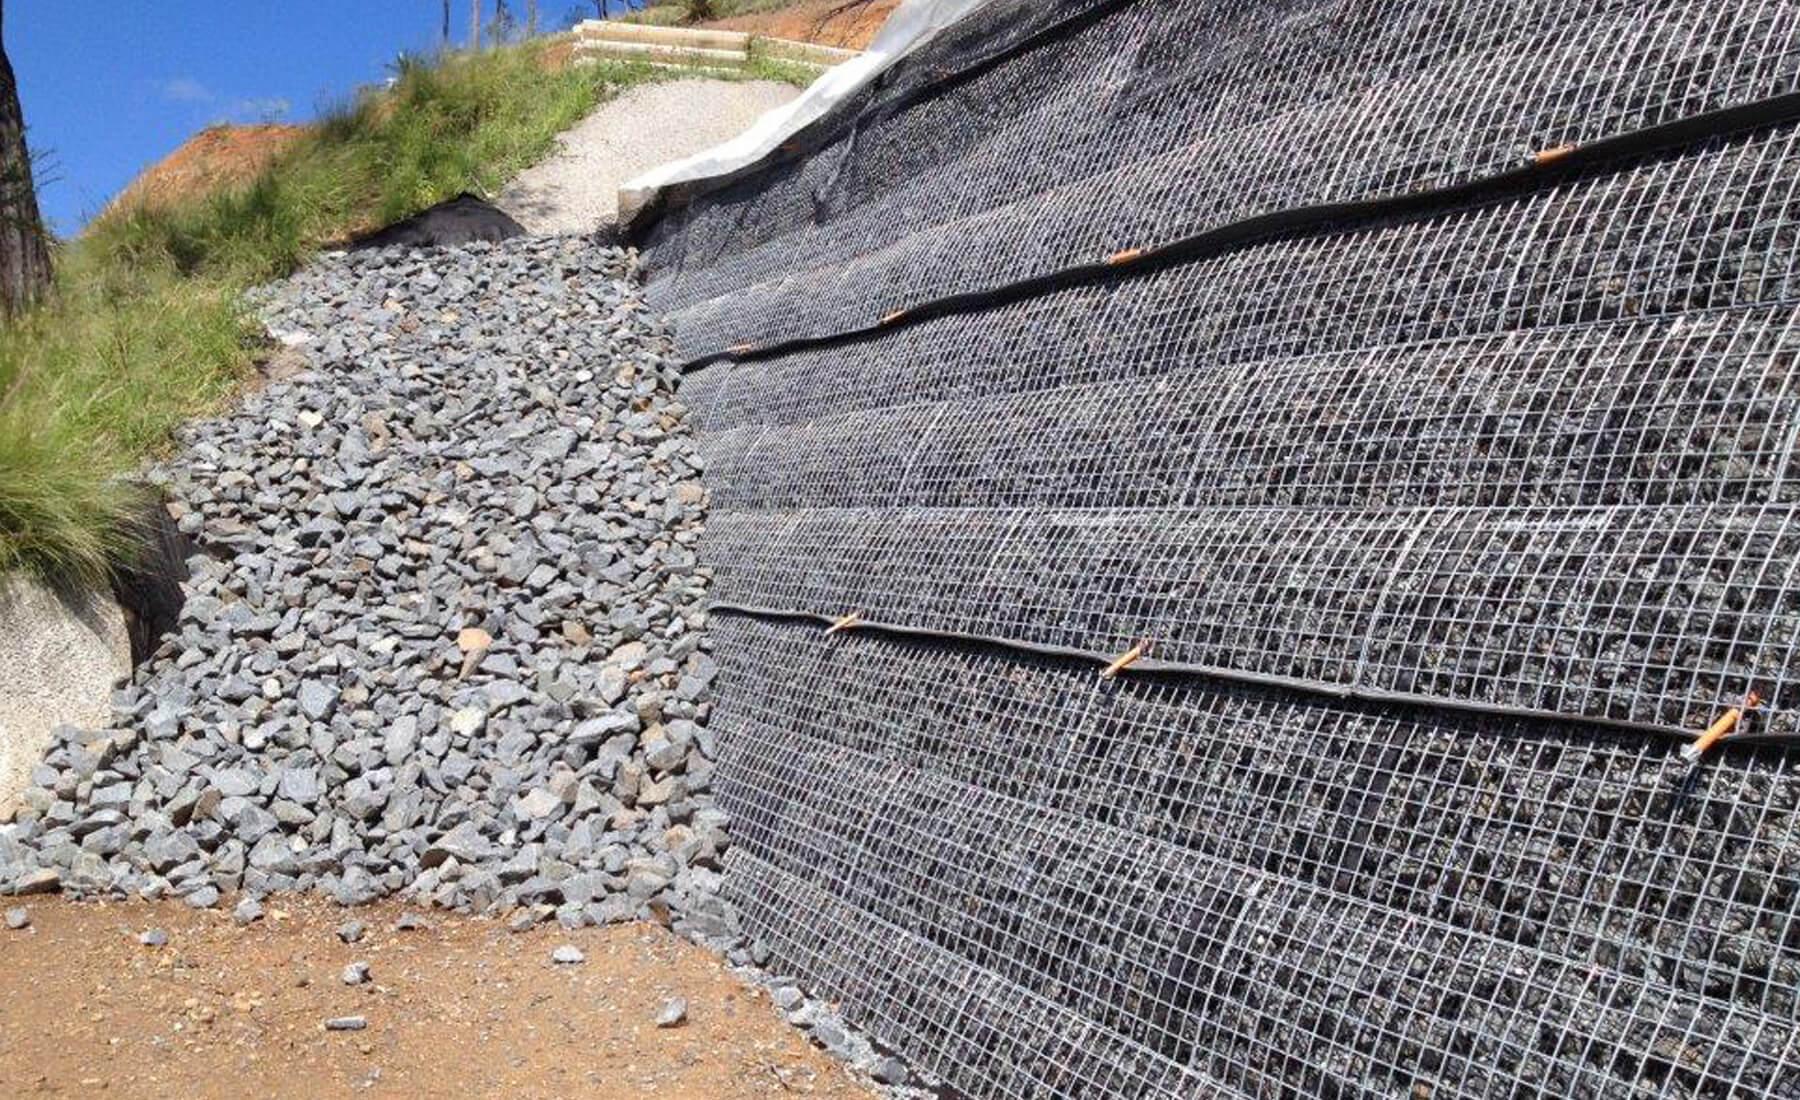 Duramesh 174 Reinforced Soil System With Steel Mesh